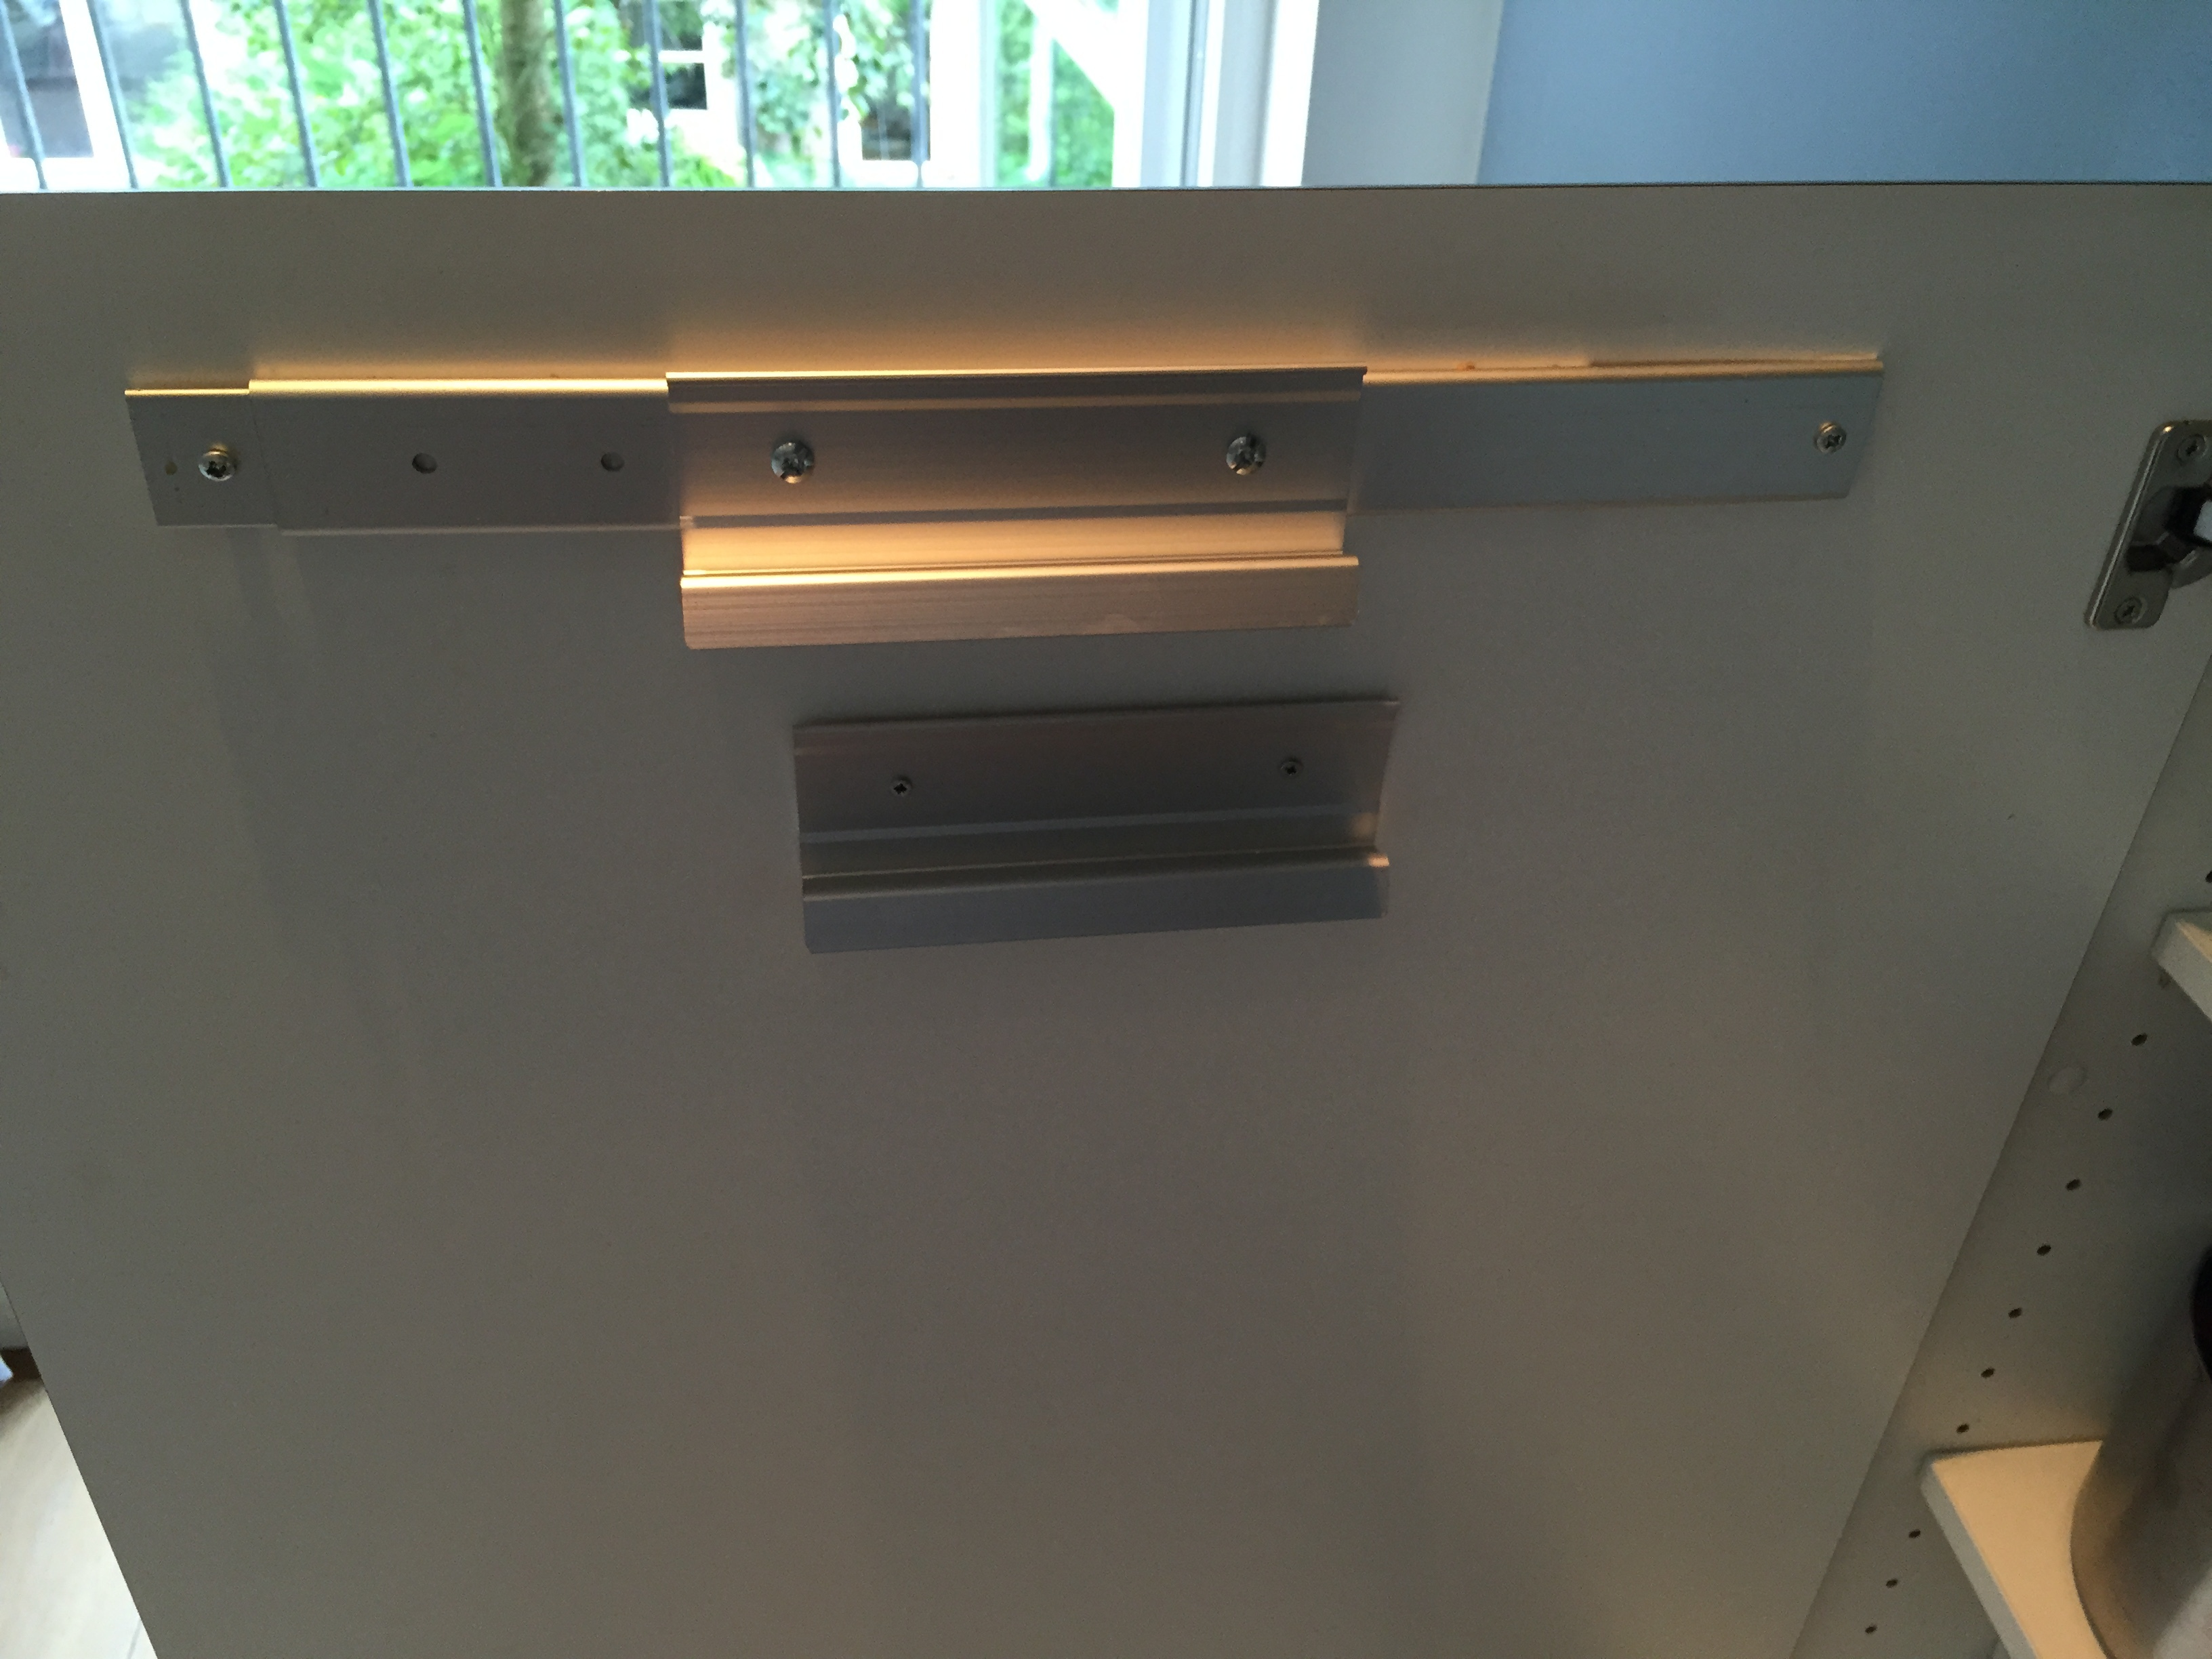 Keukenkast Ophangen Ikea : Keukenkast ophangen ikea woontips keukenkastje afstellen